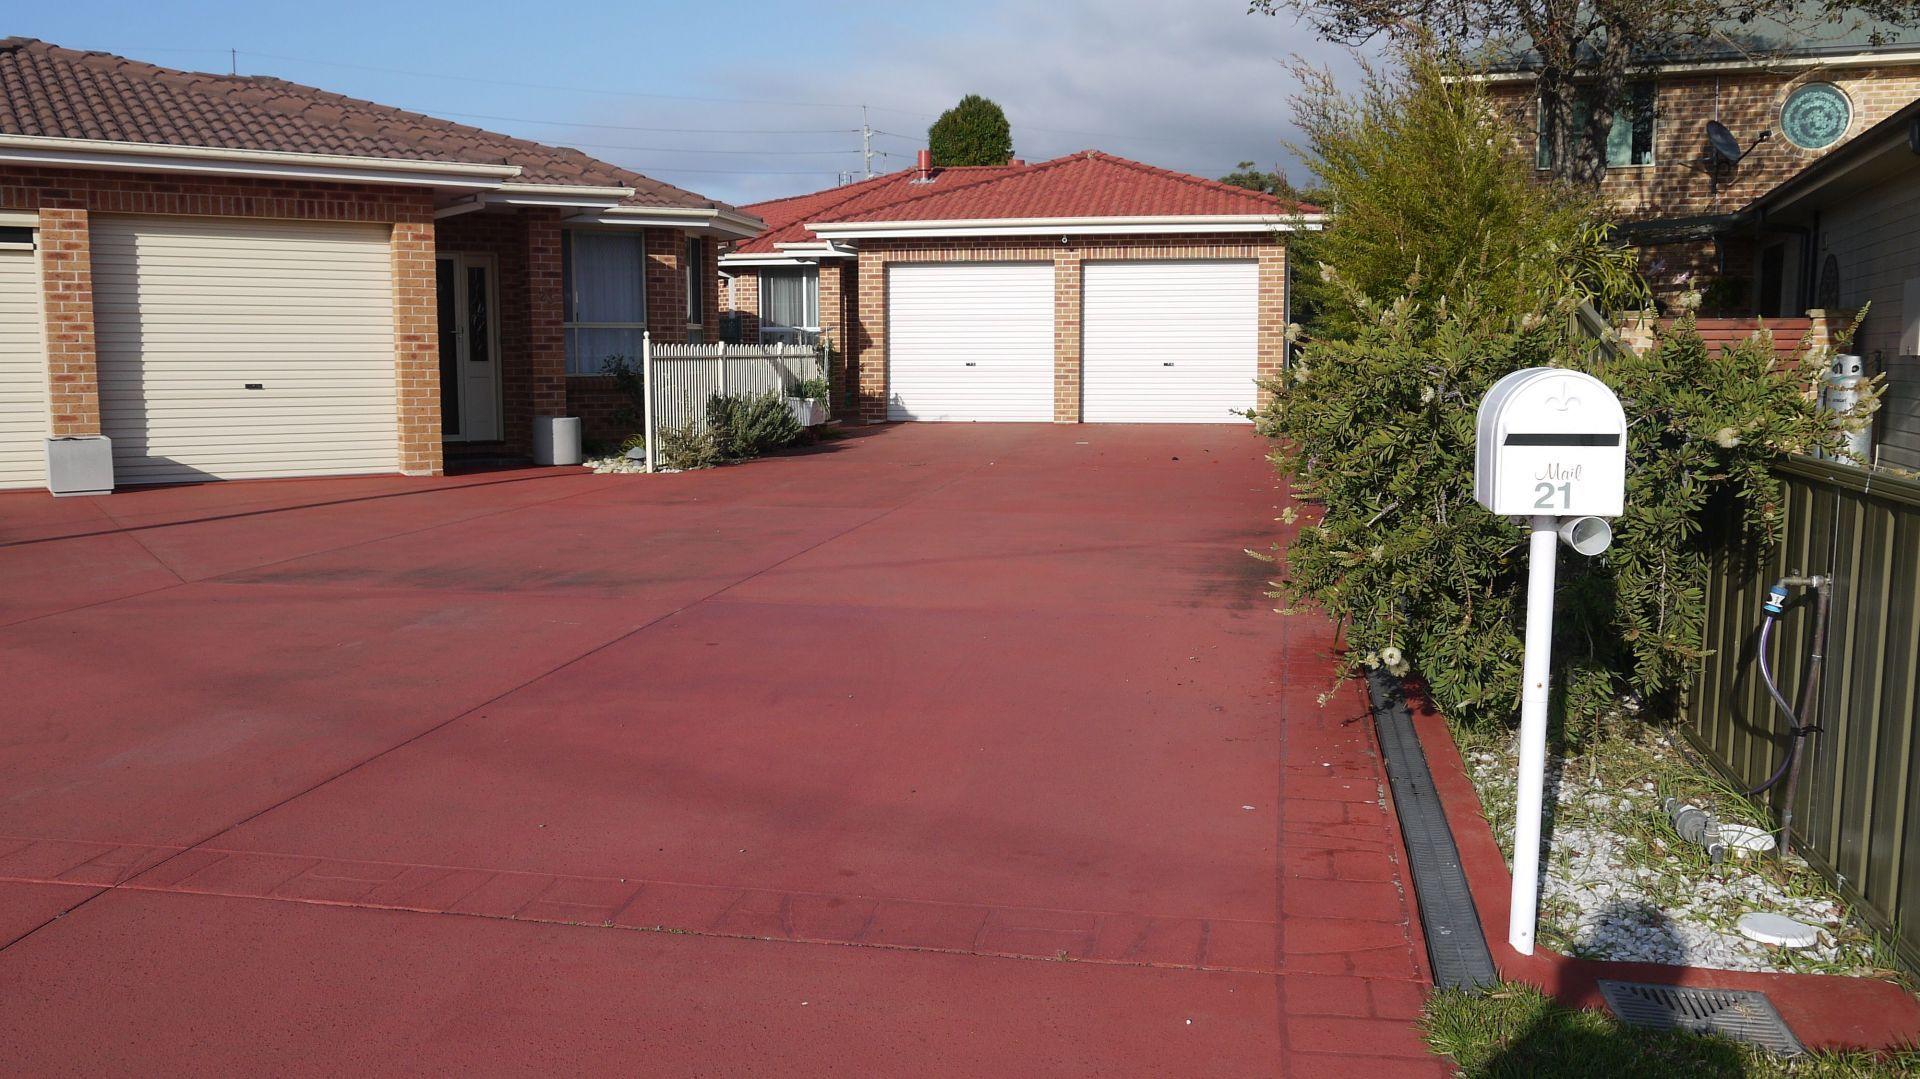 4 bedrooms House in  KILLARNEY VALE NSW, 2261